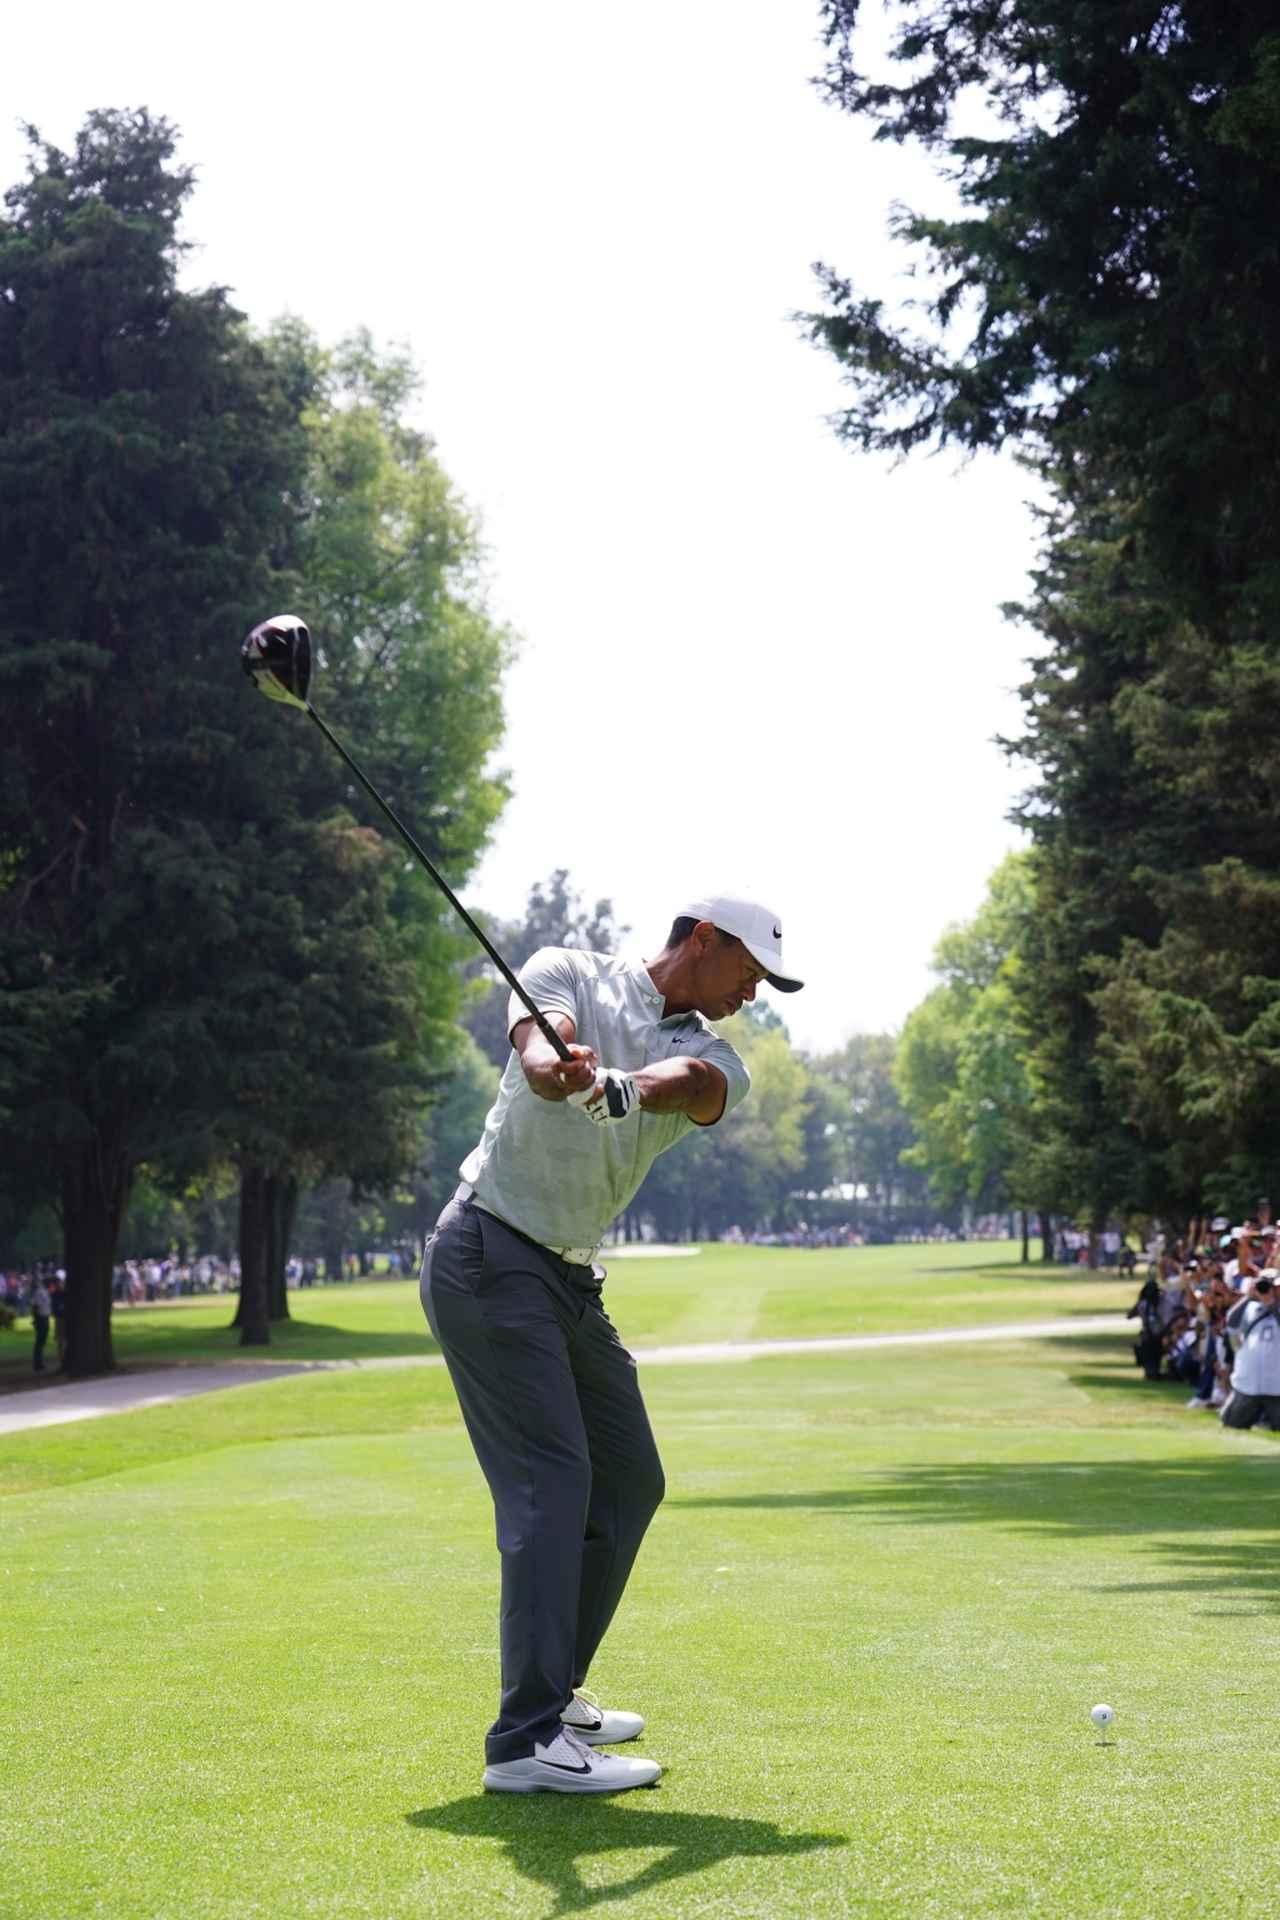 Images : 3番目の画像 - タイガー・ウッズのドライバー連続写真 - みんなのゴルフダイジェスト